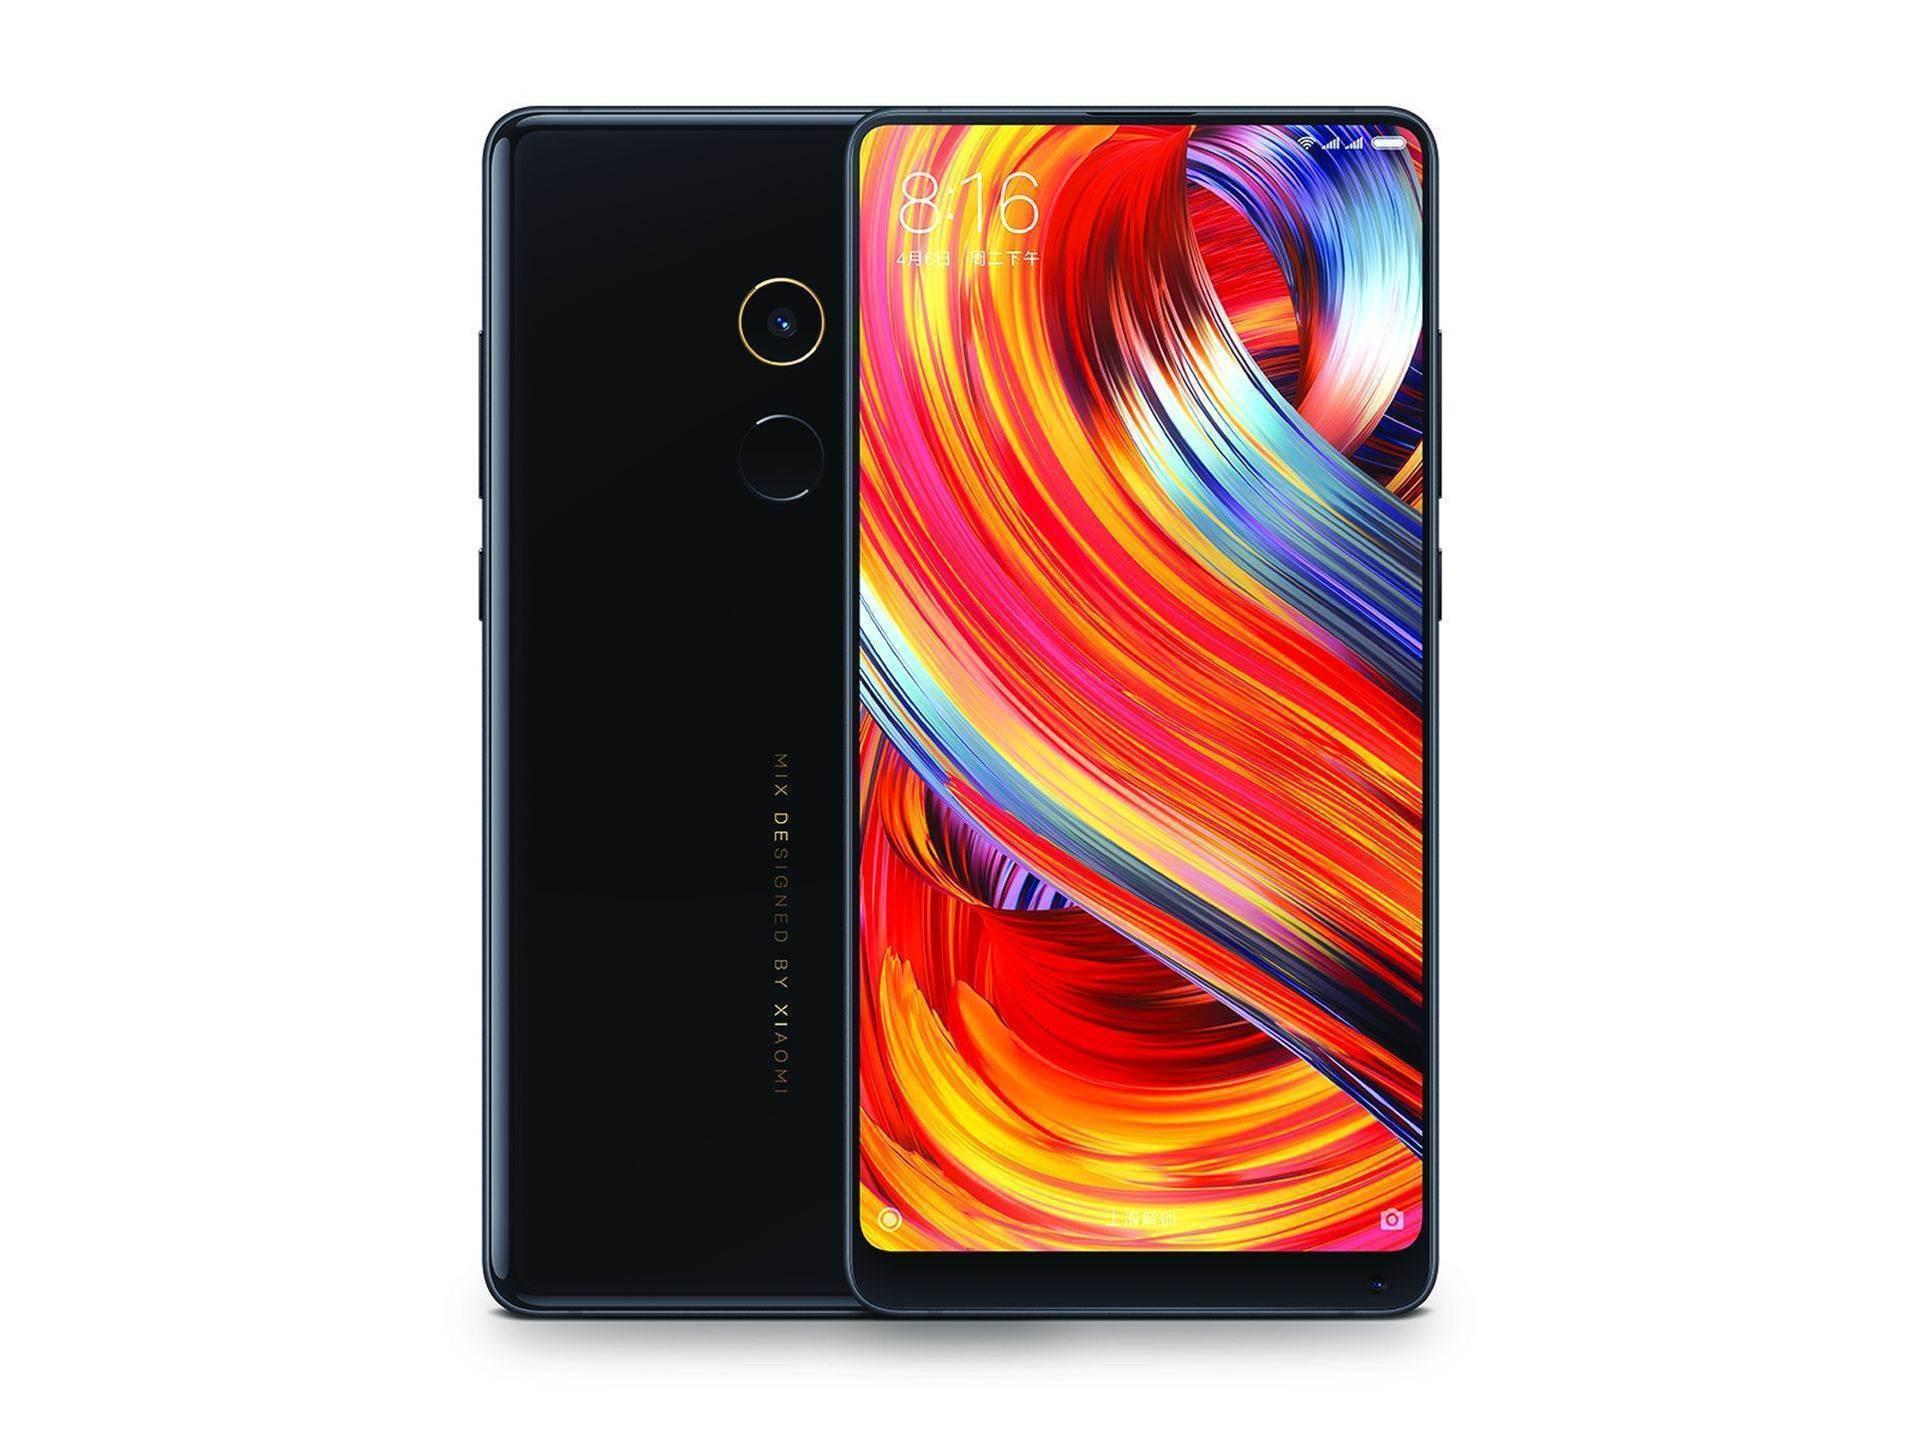 Review: Xiaomi Mi Mix 2 smartphone